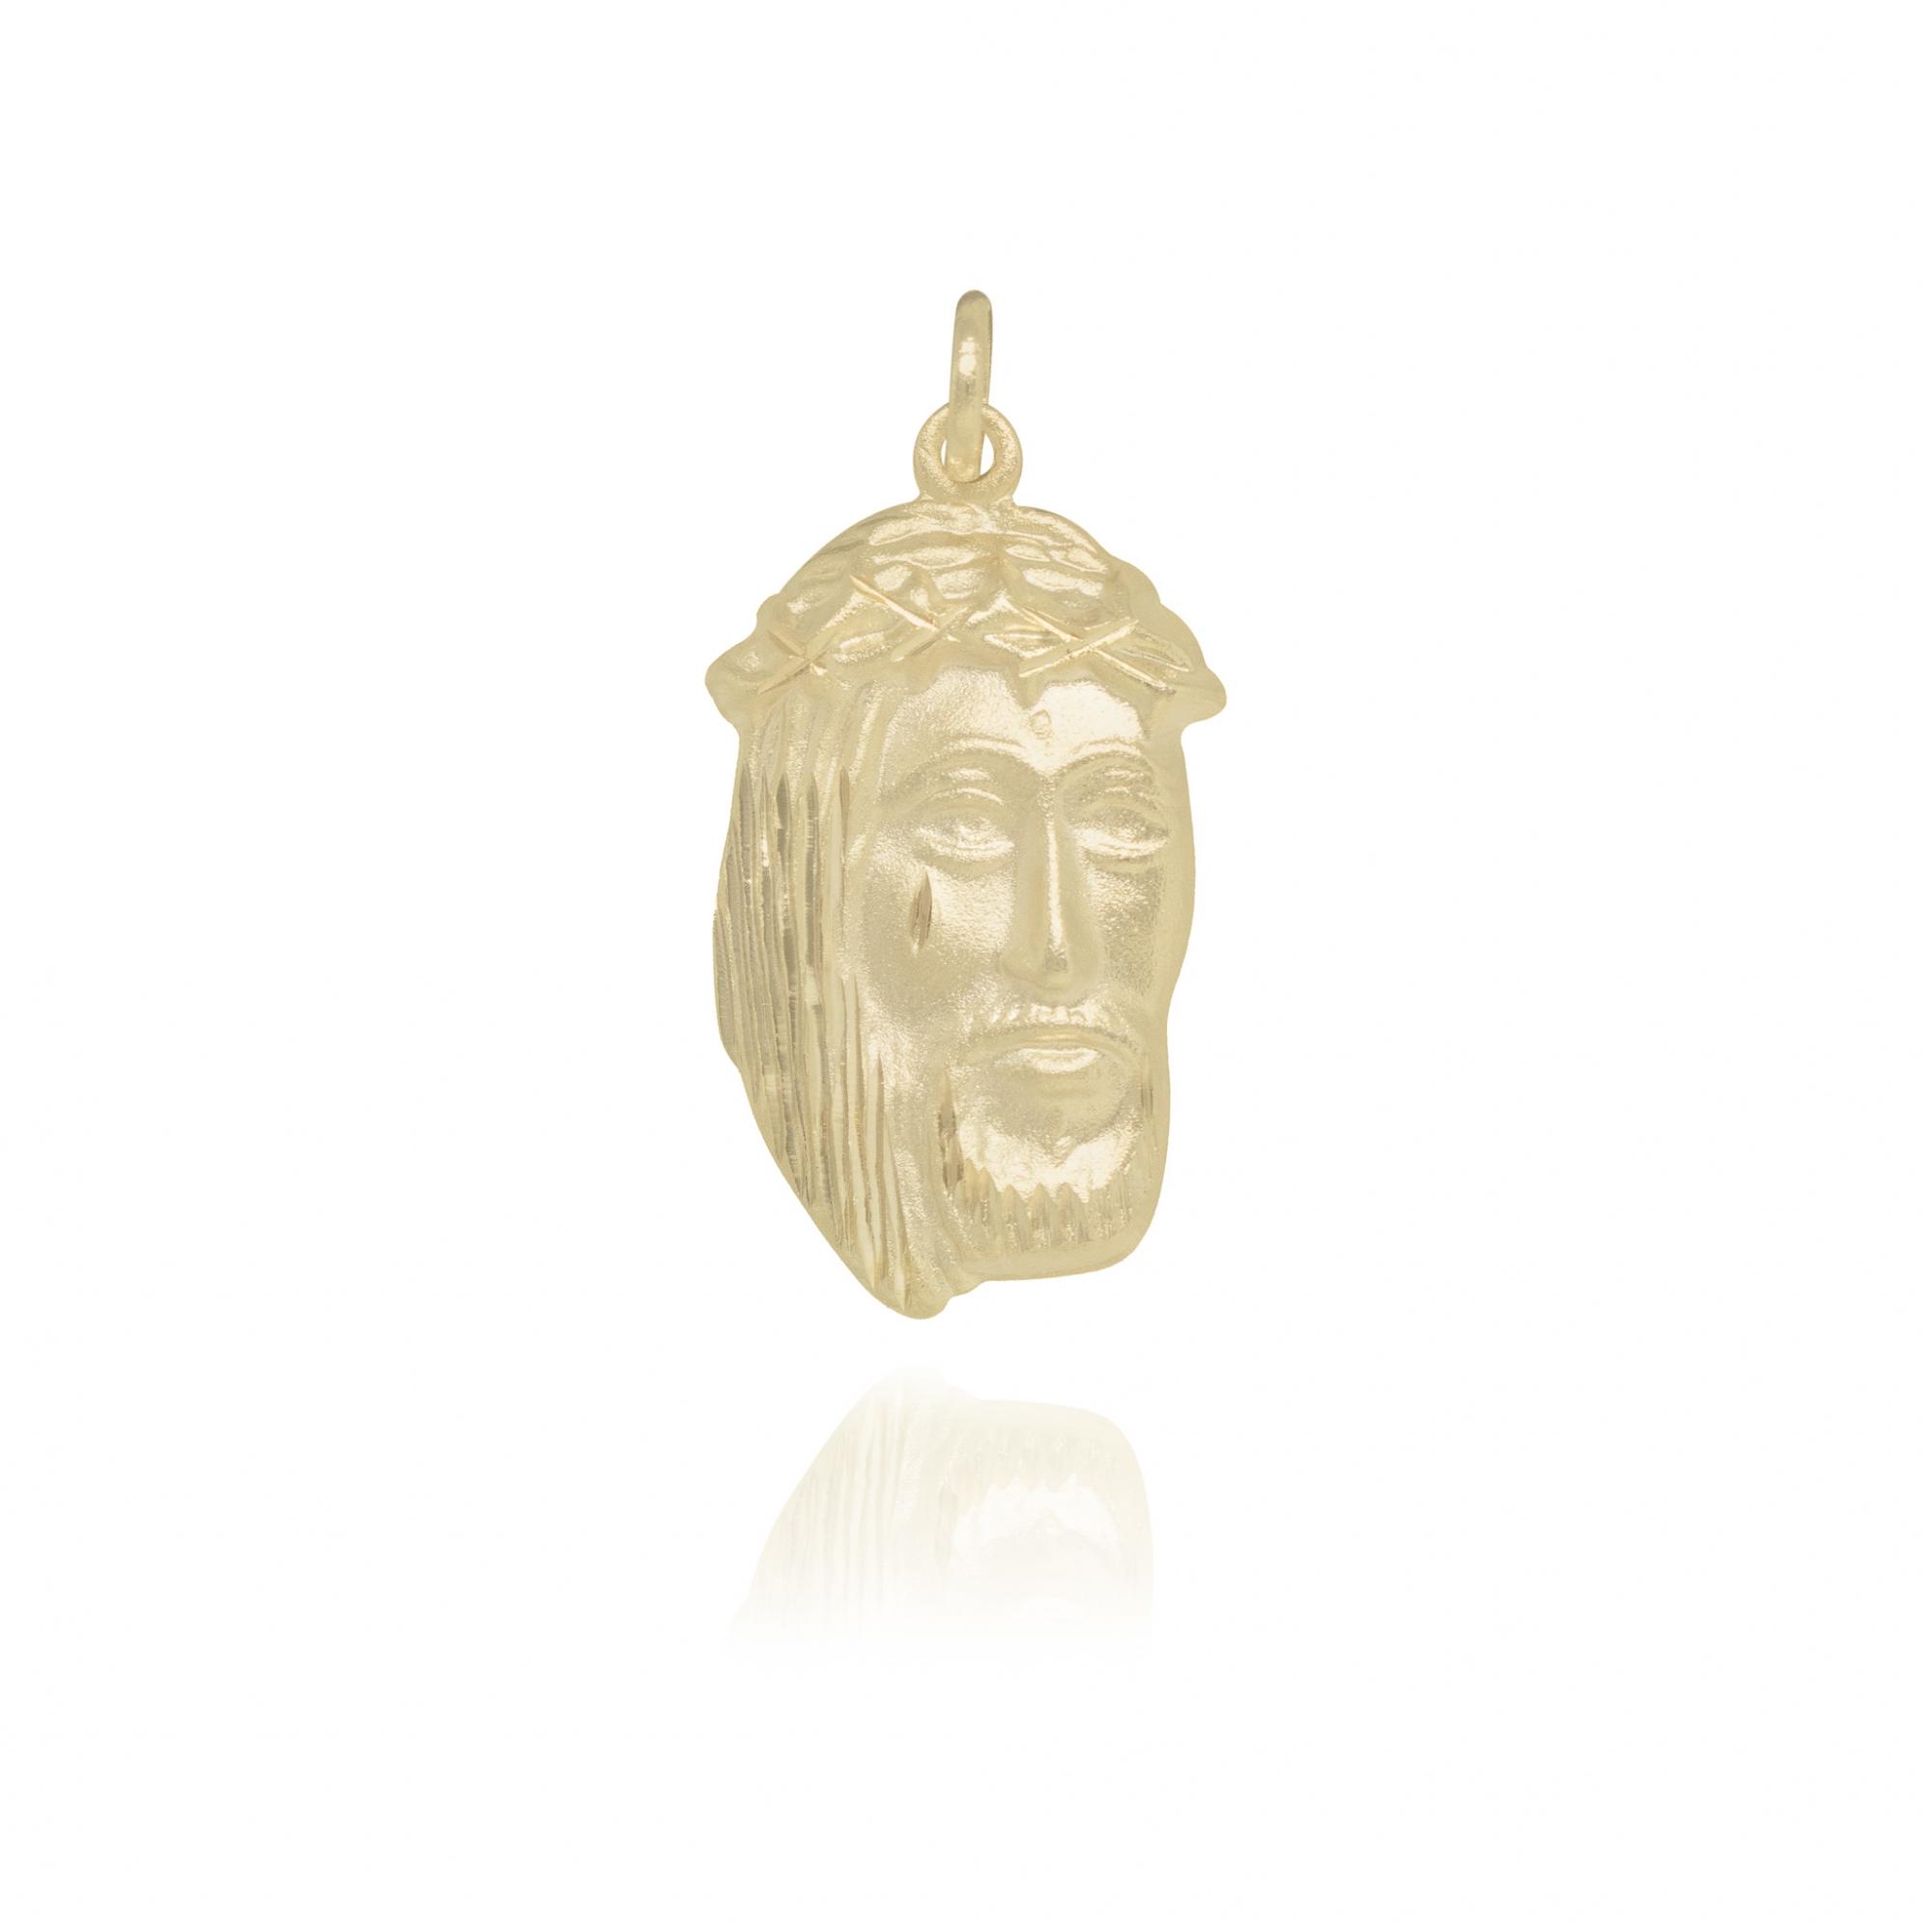 Pingente Face de Cristo Jateada semijoia folheado a ouro 18k